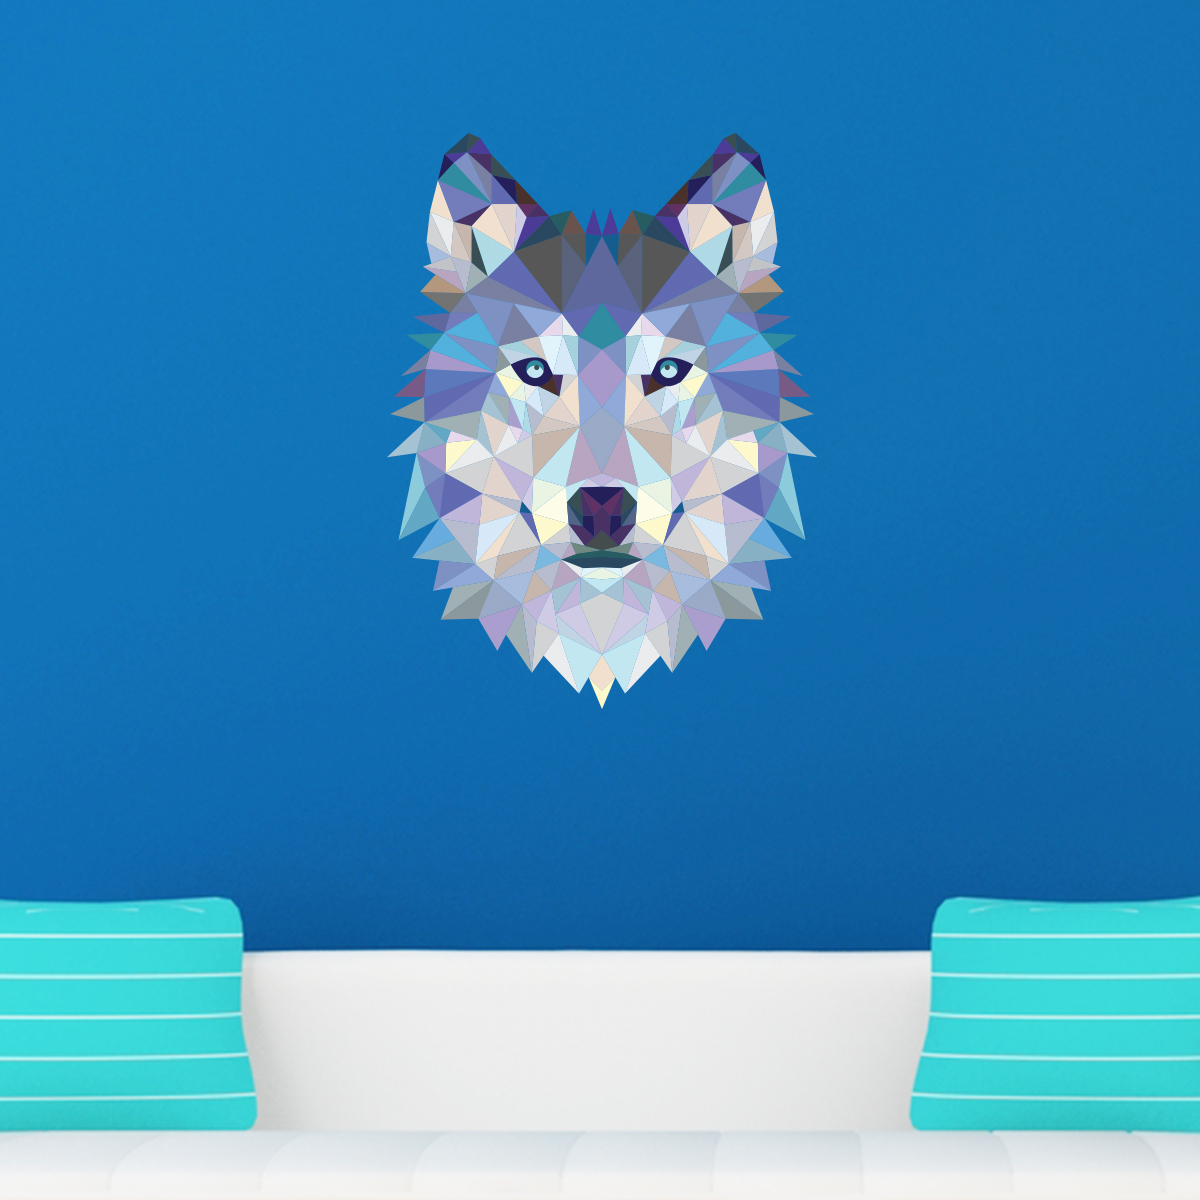 sticker origami t te de loup stickers chambre ado gar on ambiance sticker. Black Bedroom Furniture Sets. Home Design Ideas